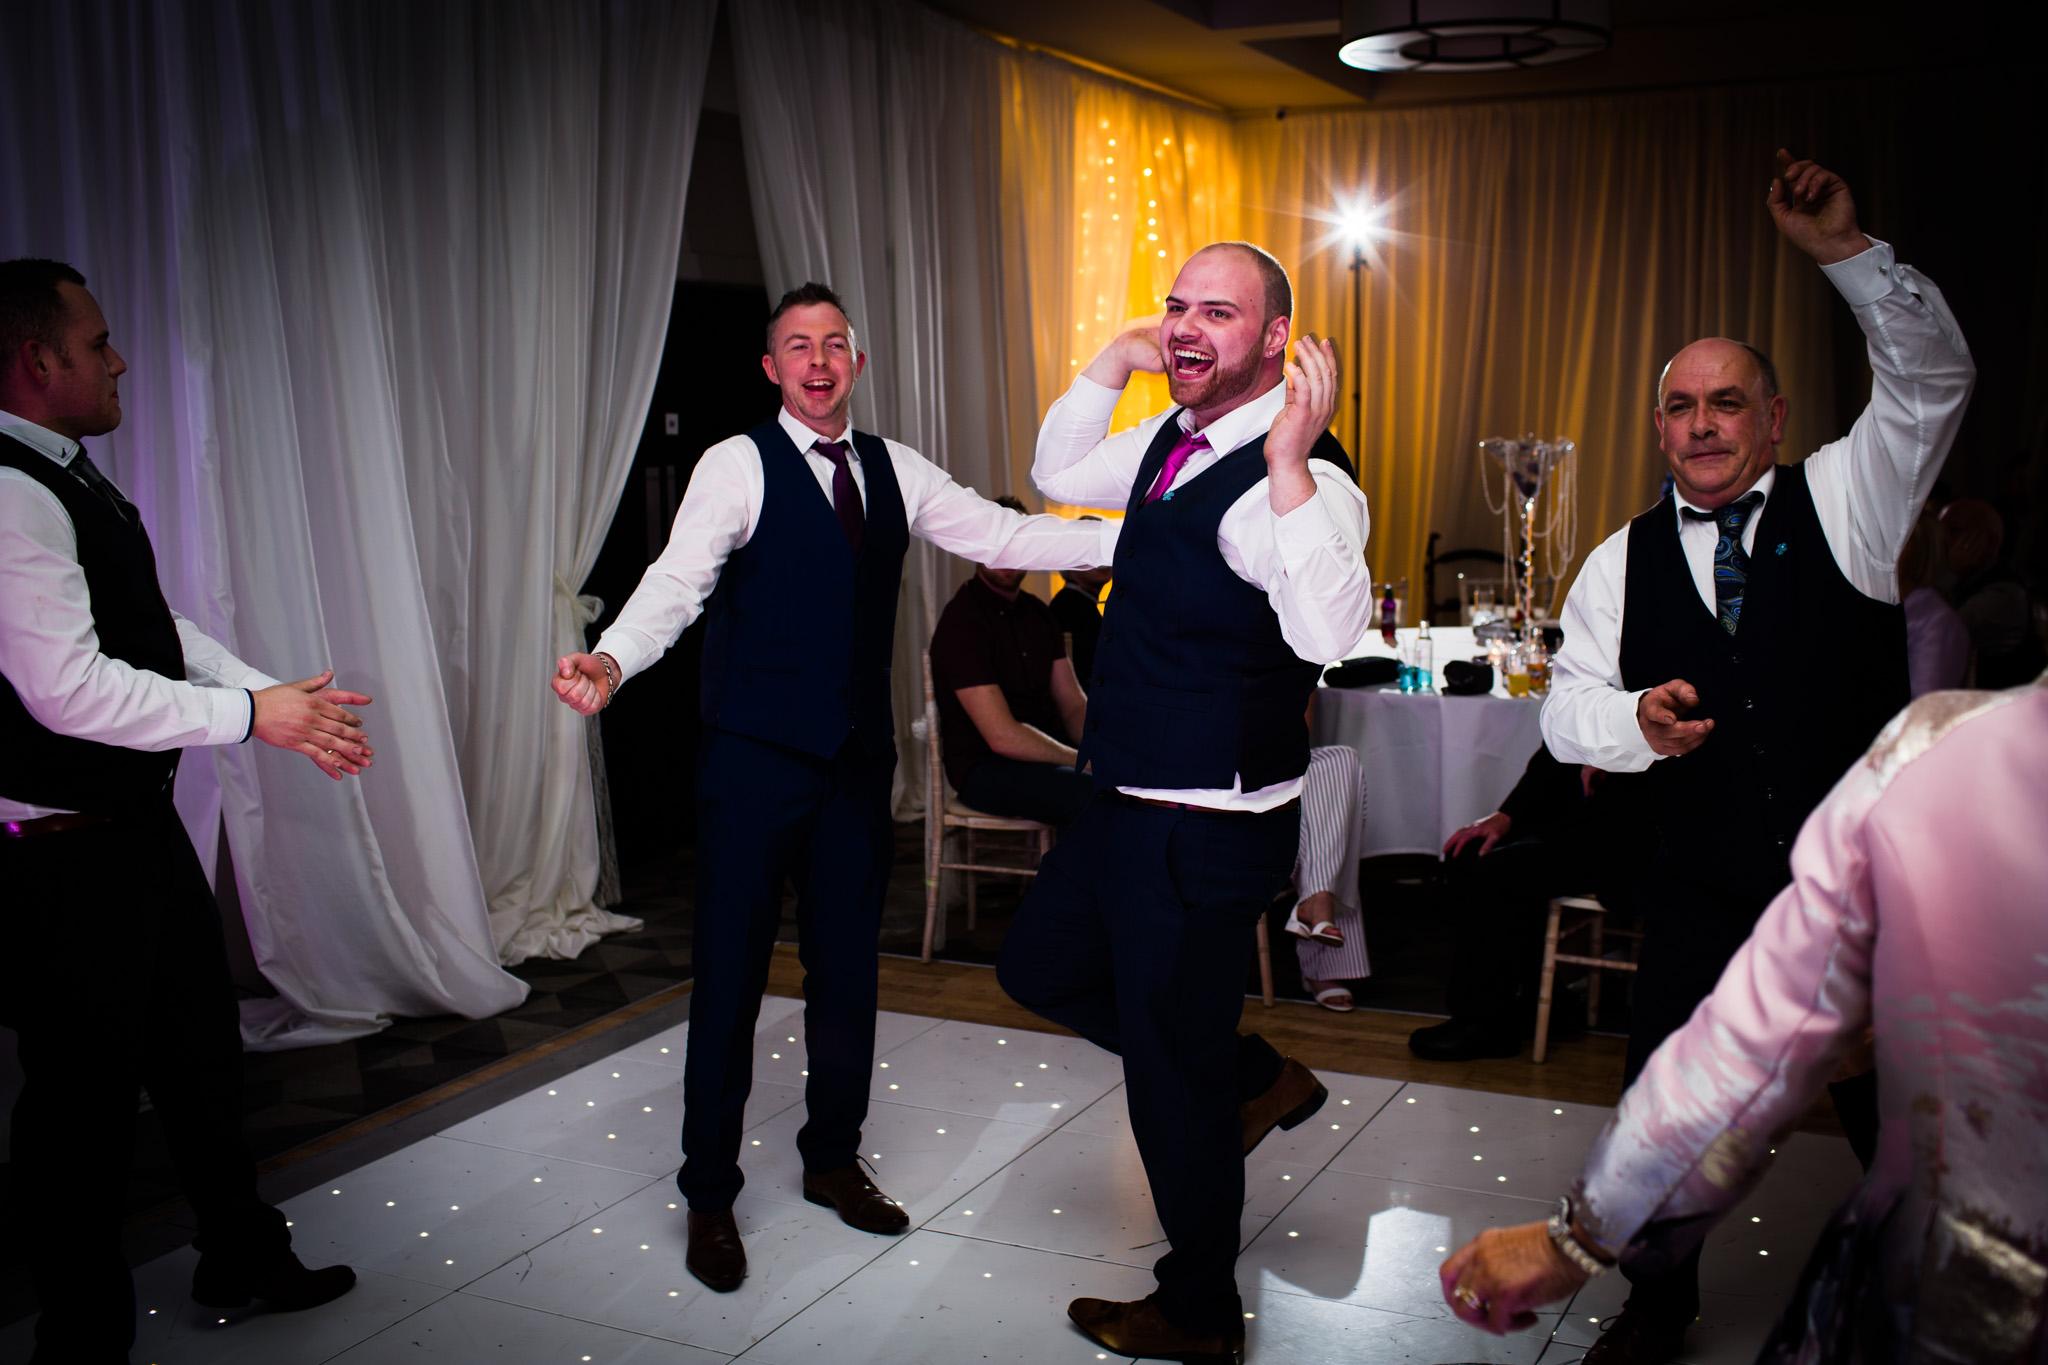 Mark_Barnes_Northern_Ireland_Wedding_Photography_Marine_hotel_ballycastle_Wedding_Photography_Janet&Darren-46.jpg